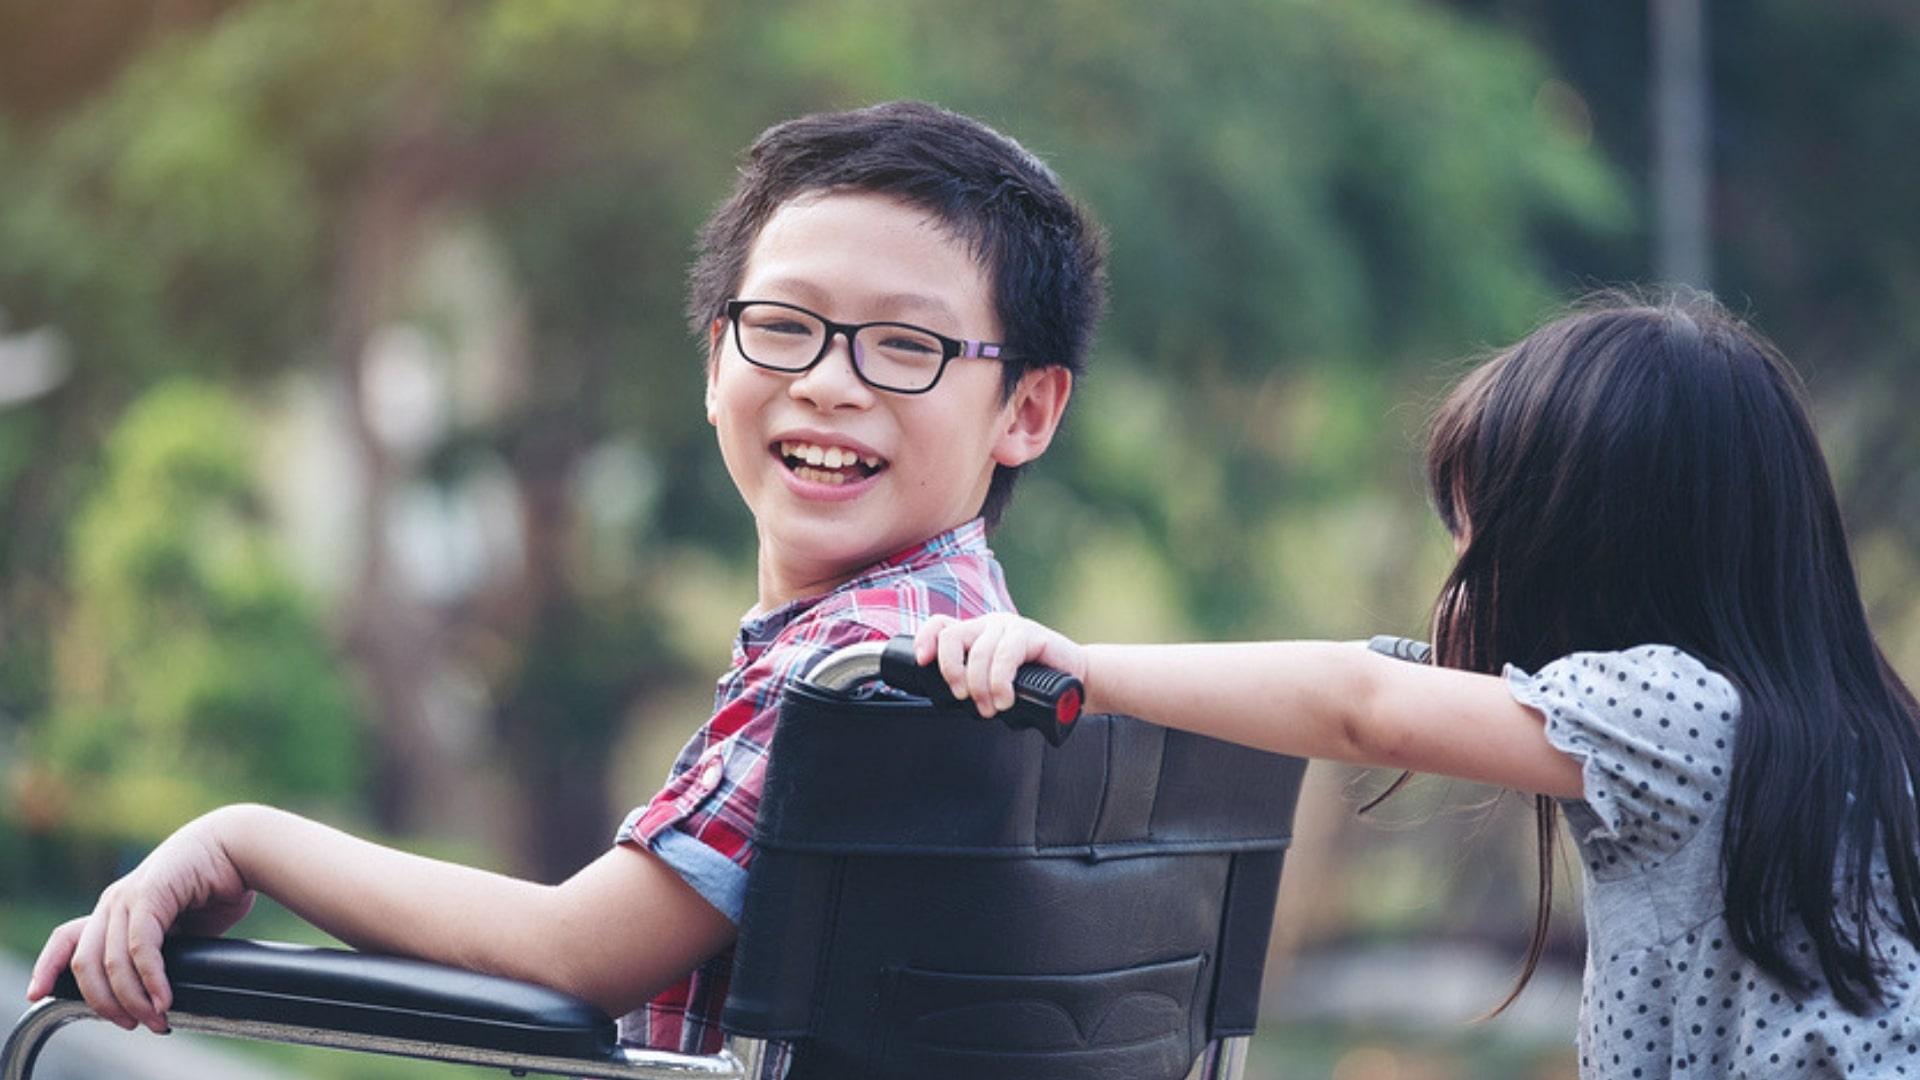 Inklusion Junge im Rollstuhl